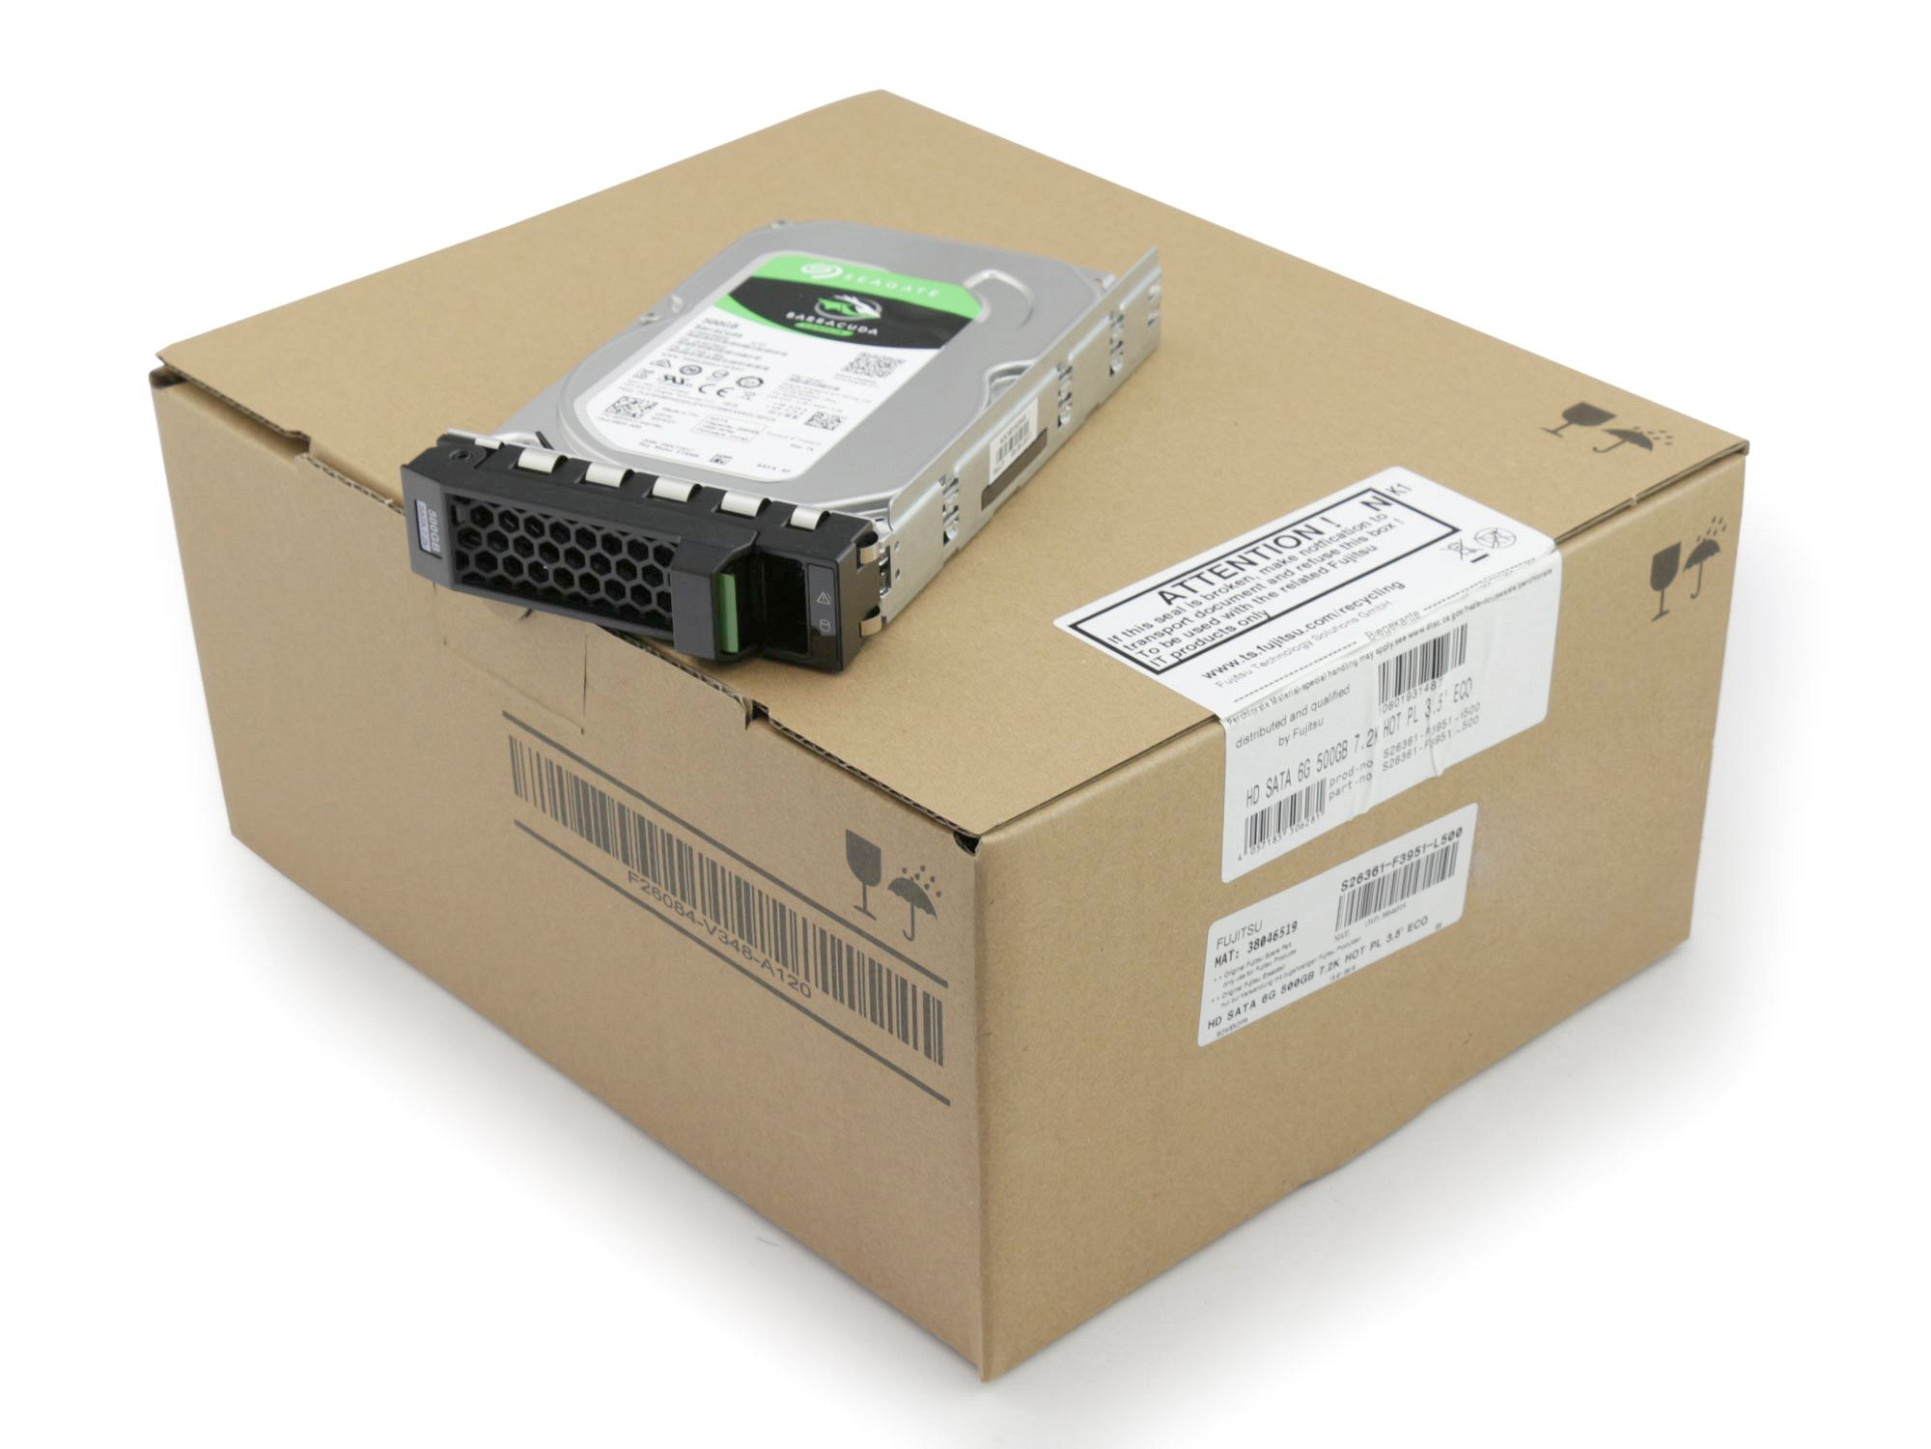 Server Festplatte HDD 500GB (3,5 Zoll / 8,9 cm) S-ATA III (6,0 Gb/s) ECO 7.2K inkl. Hot-Plug für Fujitsu Primergy RX1330 M2